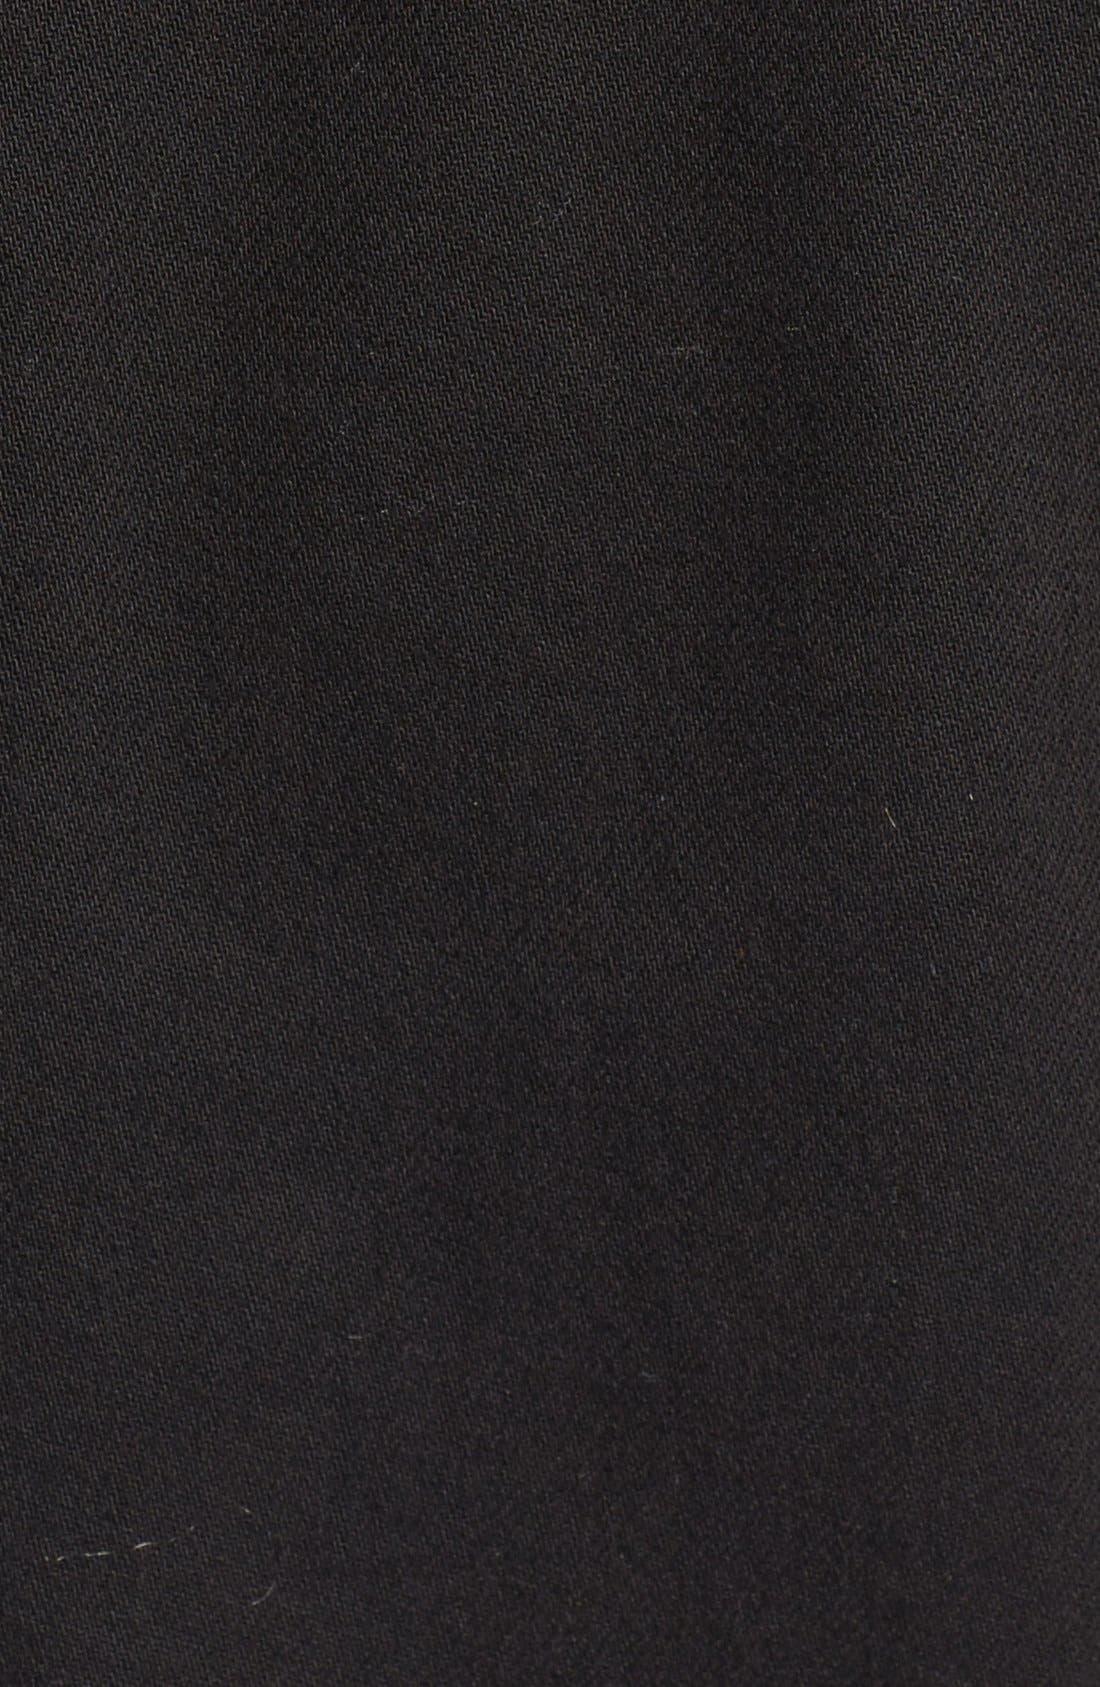 'Vivienne' Denim Jacket,                             Alternate thumbnail 5, color,                             Black Hawk